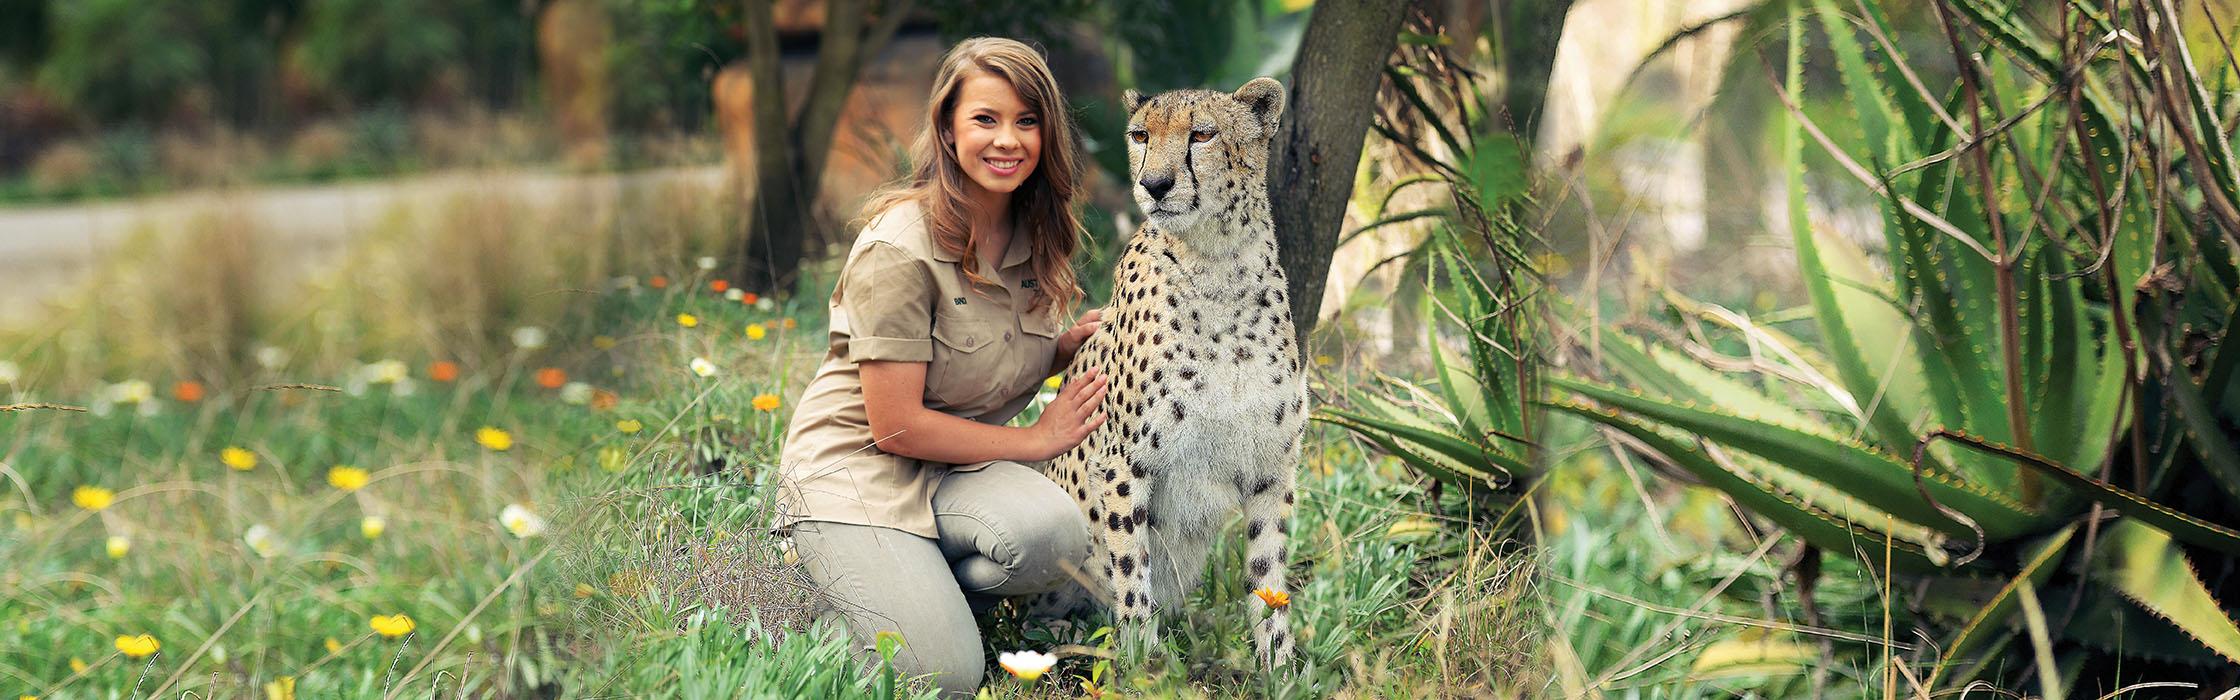 Experiences-Animal Encounters-CheekyCheetah2240x700